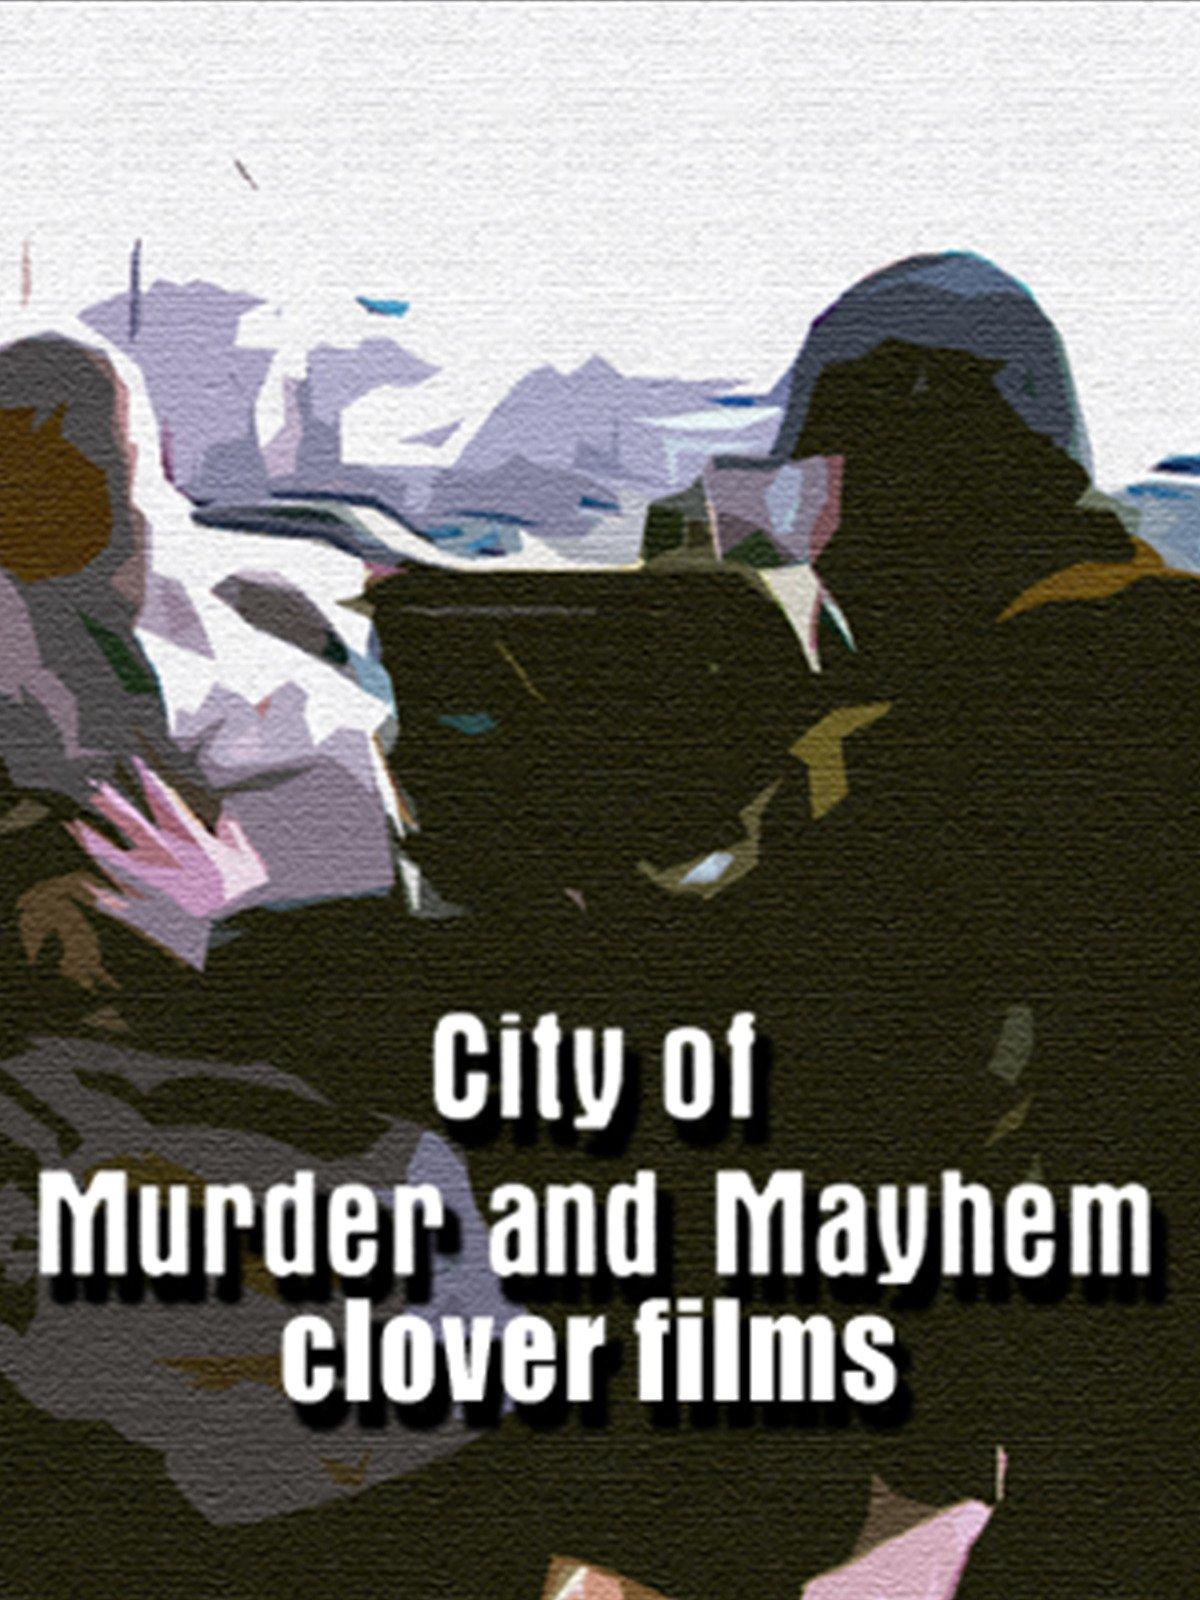 City of Murder and Mayhem